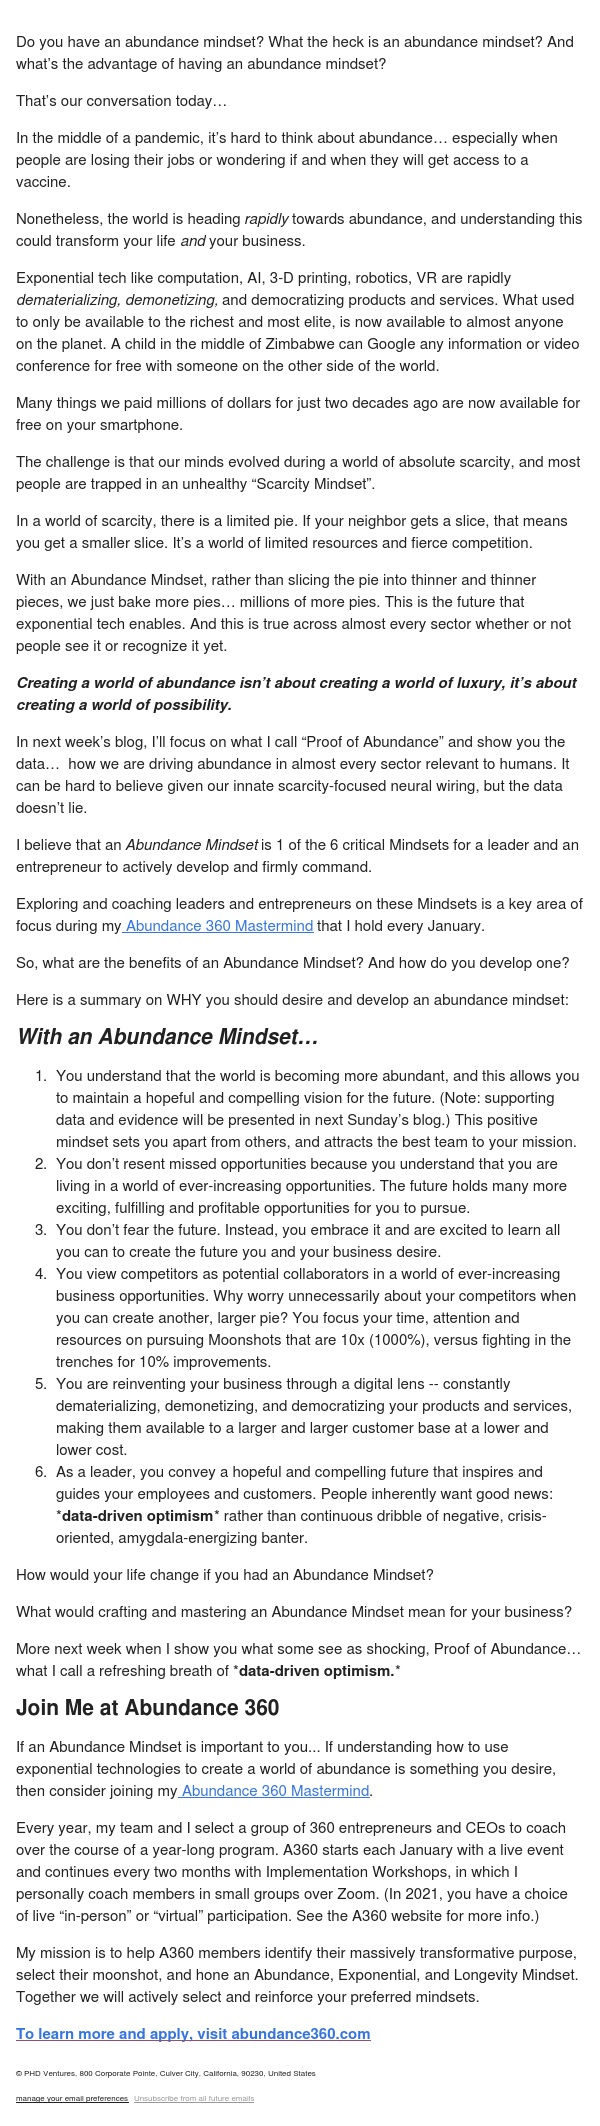 Why an Abundance Mindset?